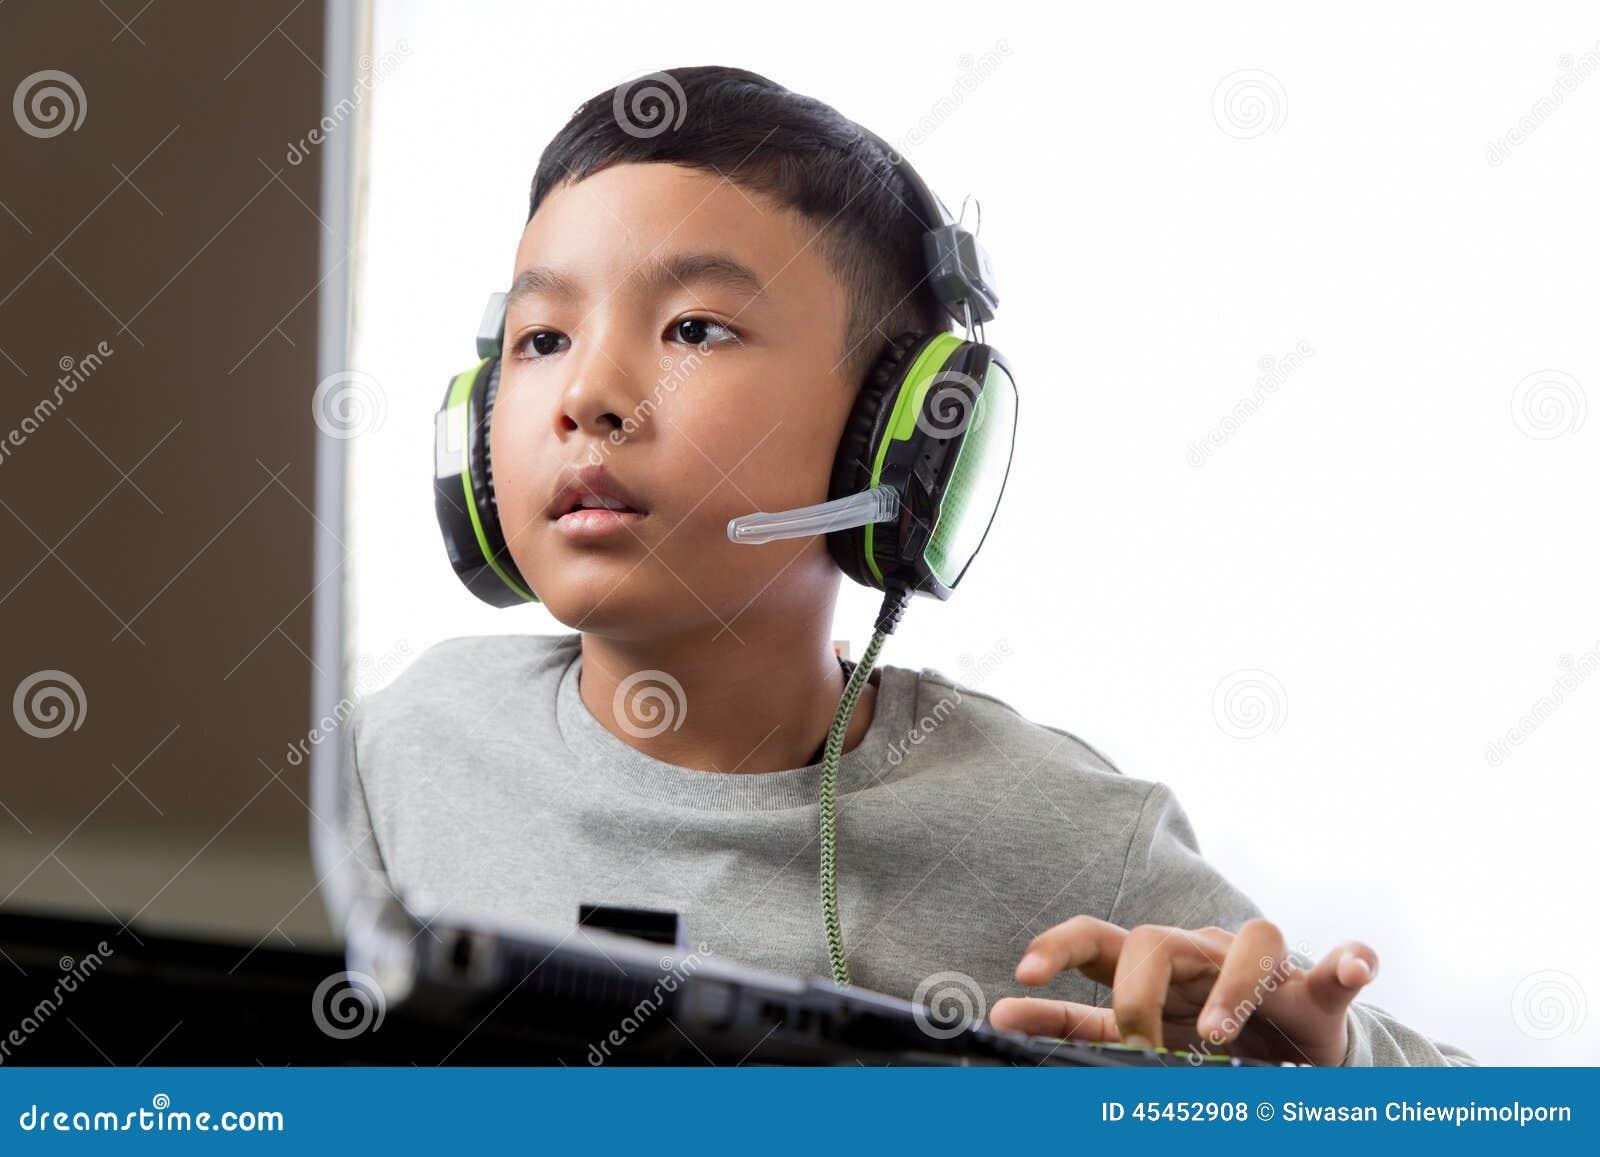 Asian Computer Games 94